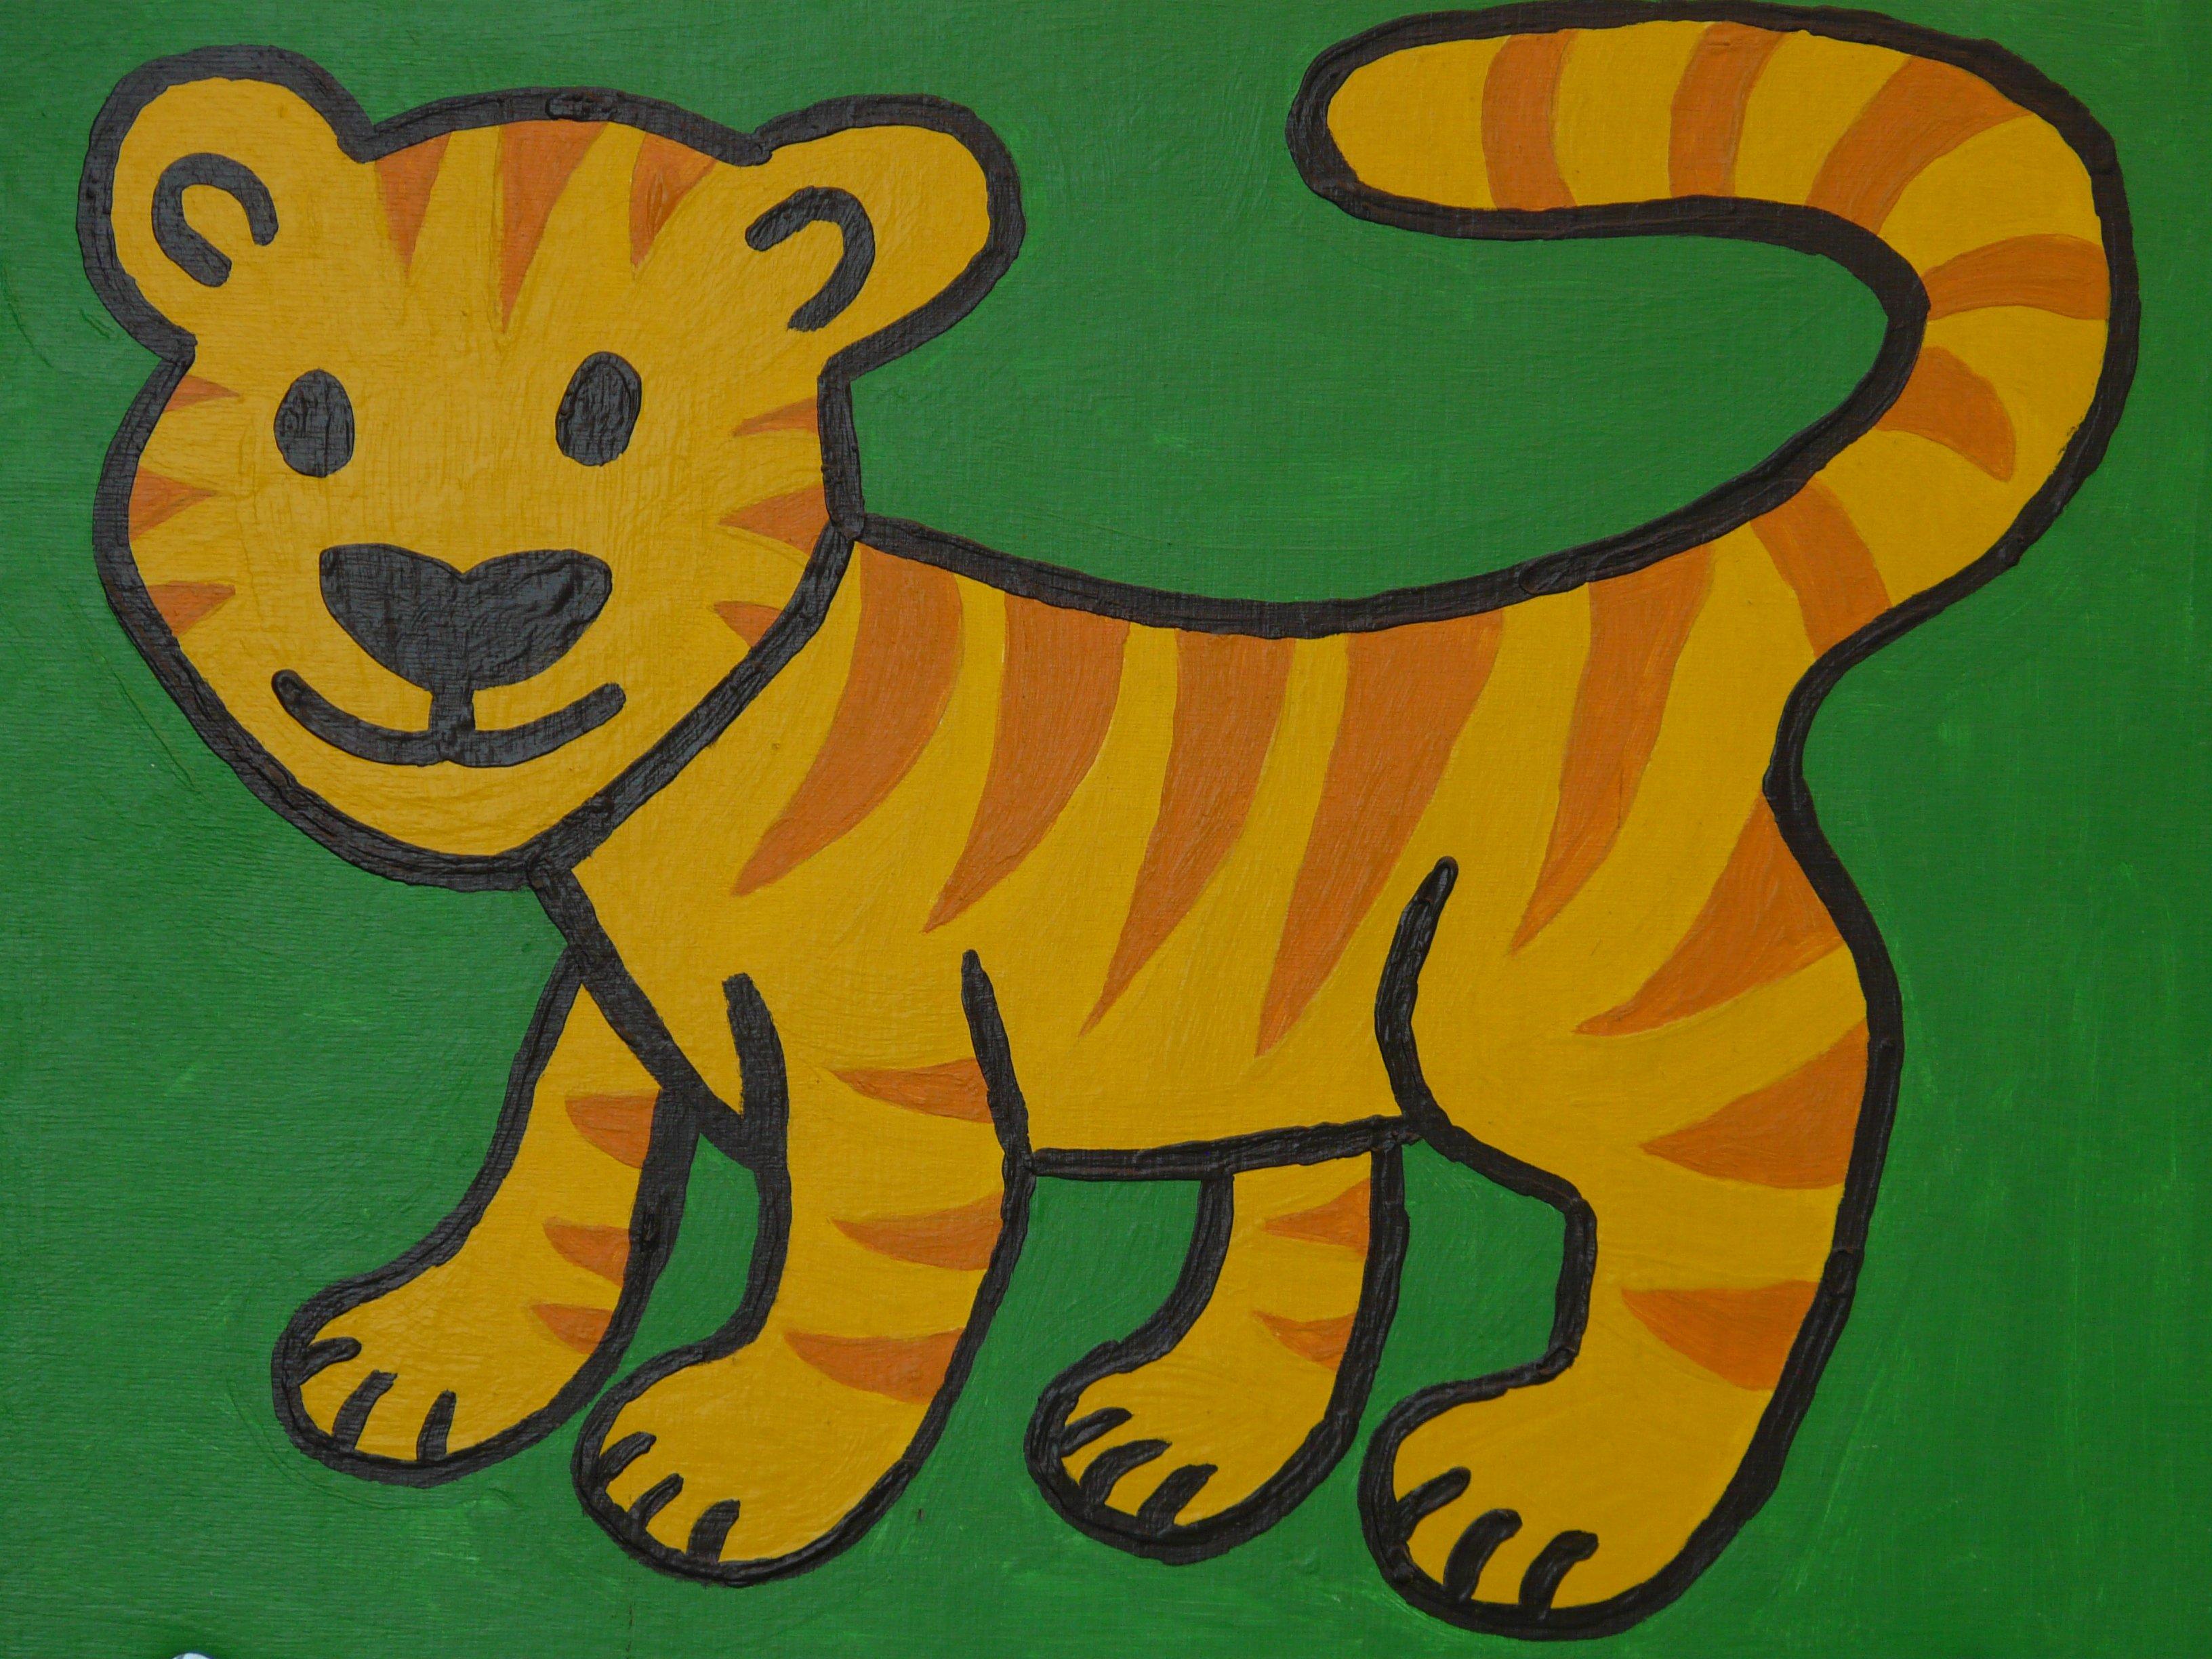 Kumpulan Gambar Hewan Harimau Kartun Paling Baru - Infobaru